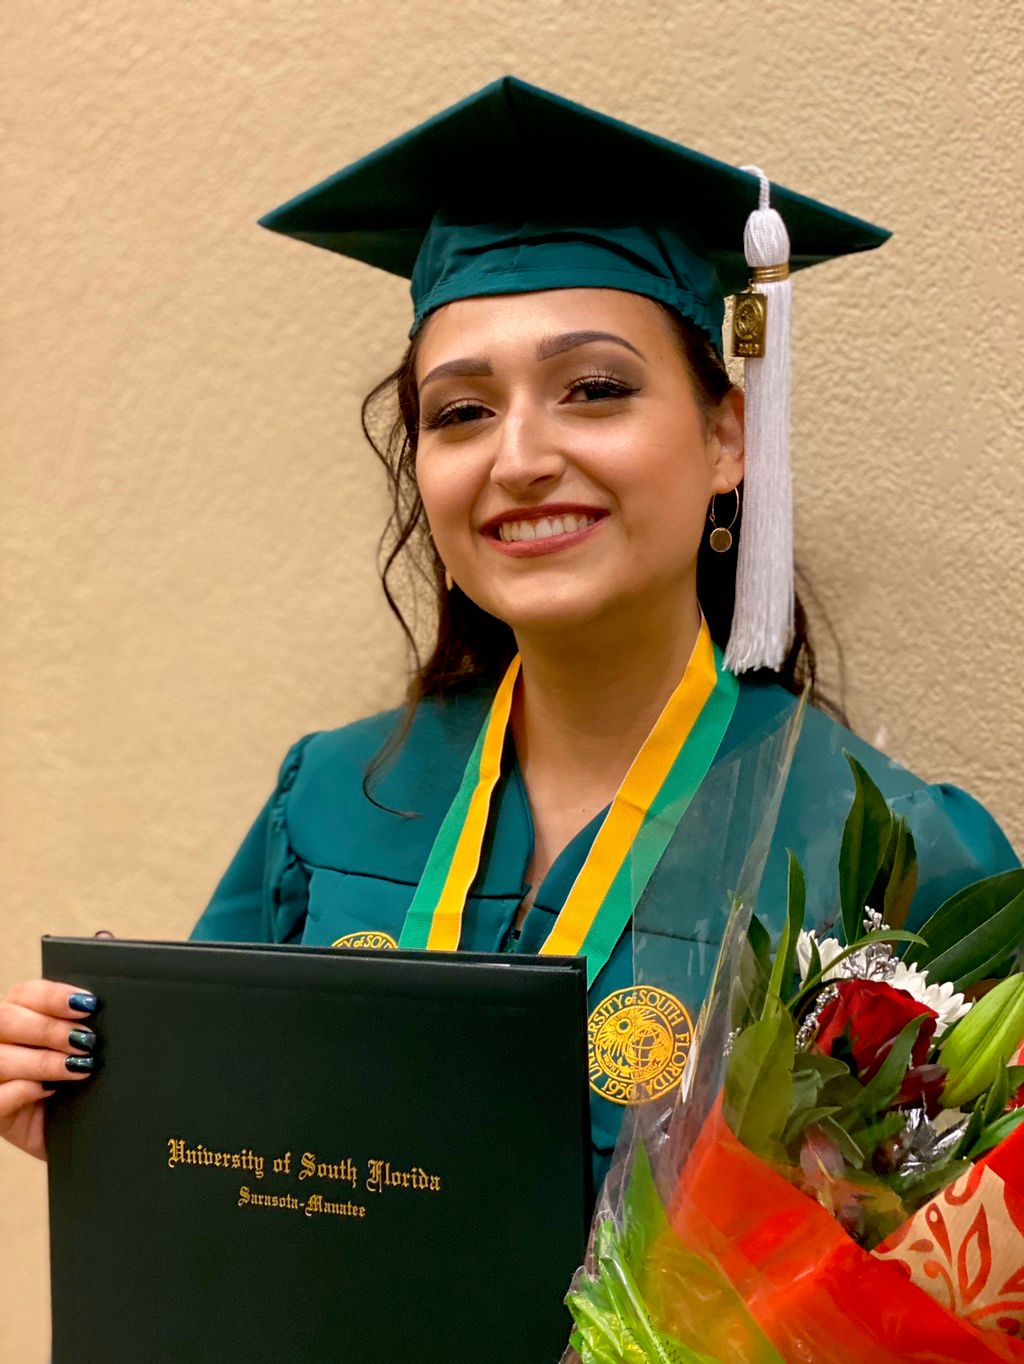 Graduation Hair Styling & Makeup - Bradenton 2019